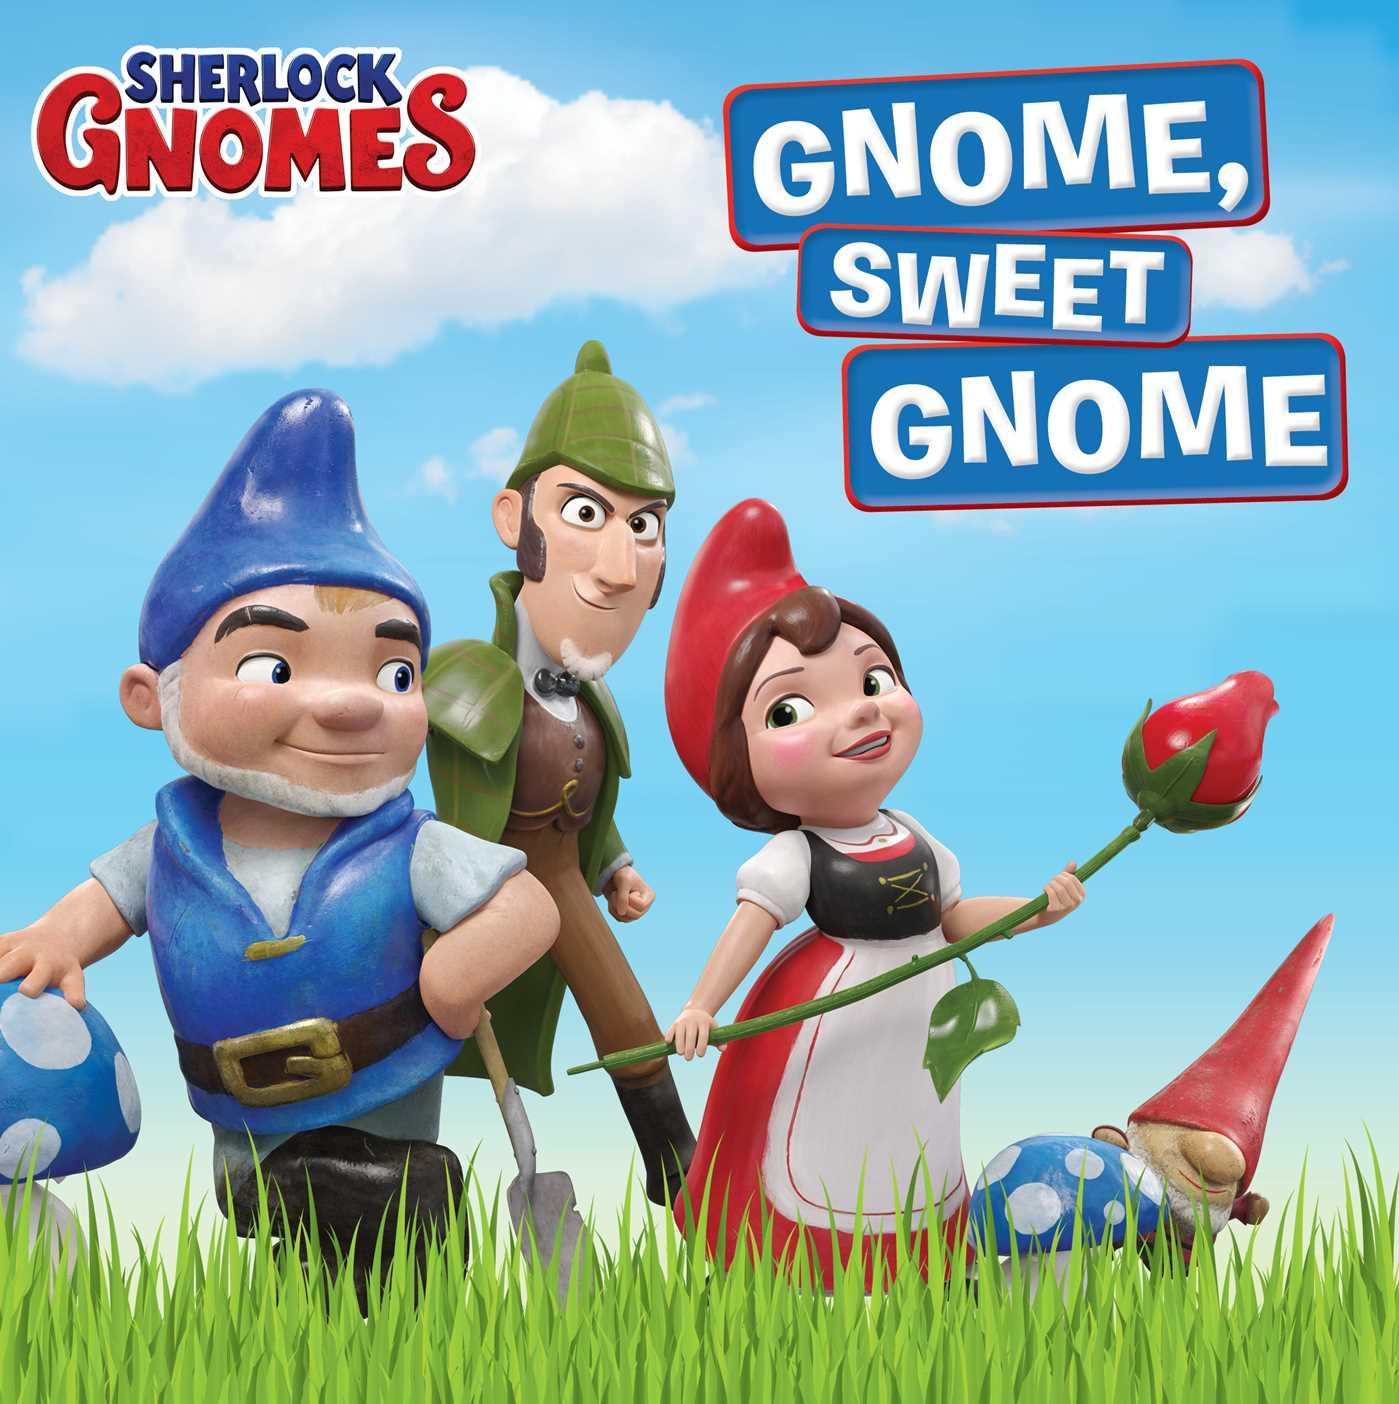 Gnome sweet gnome 9781534410541 hr